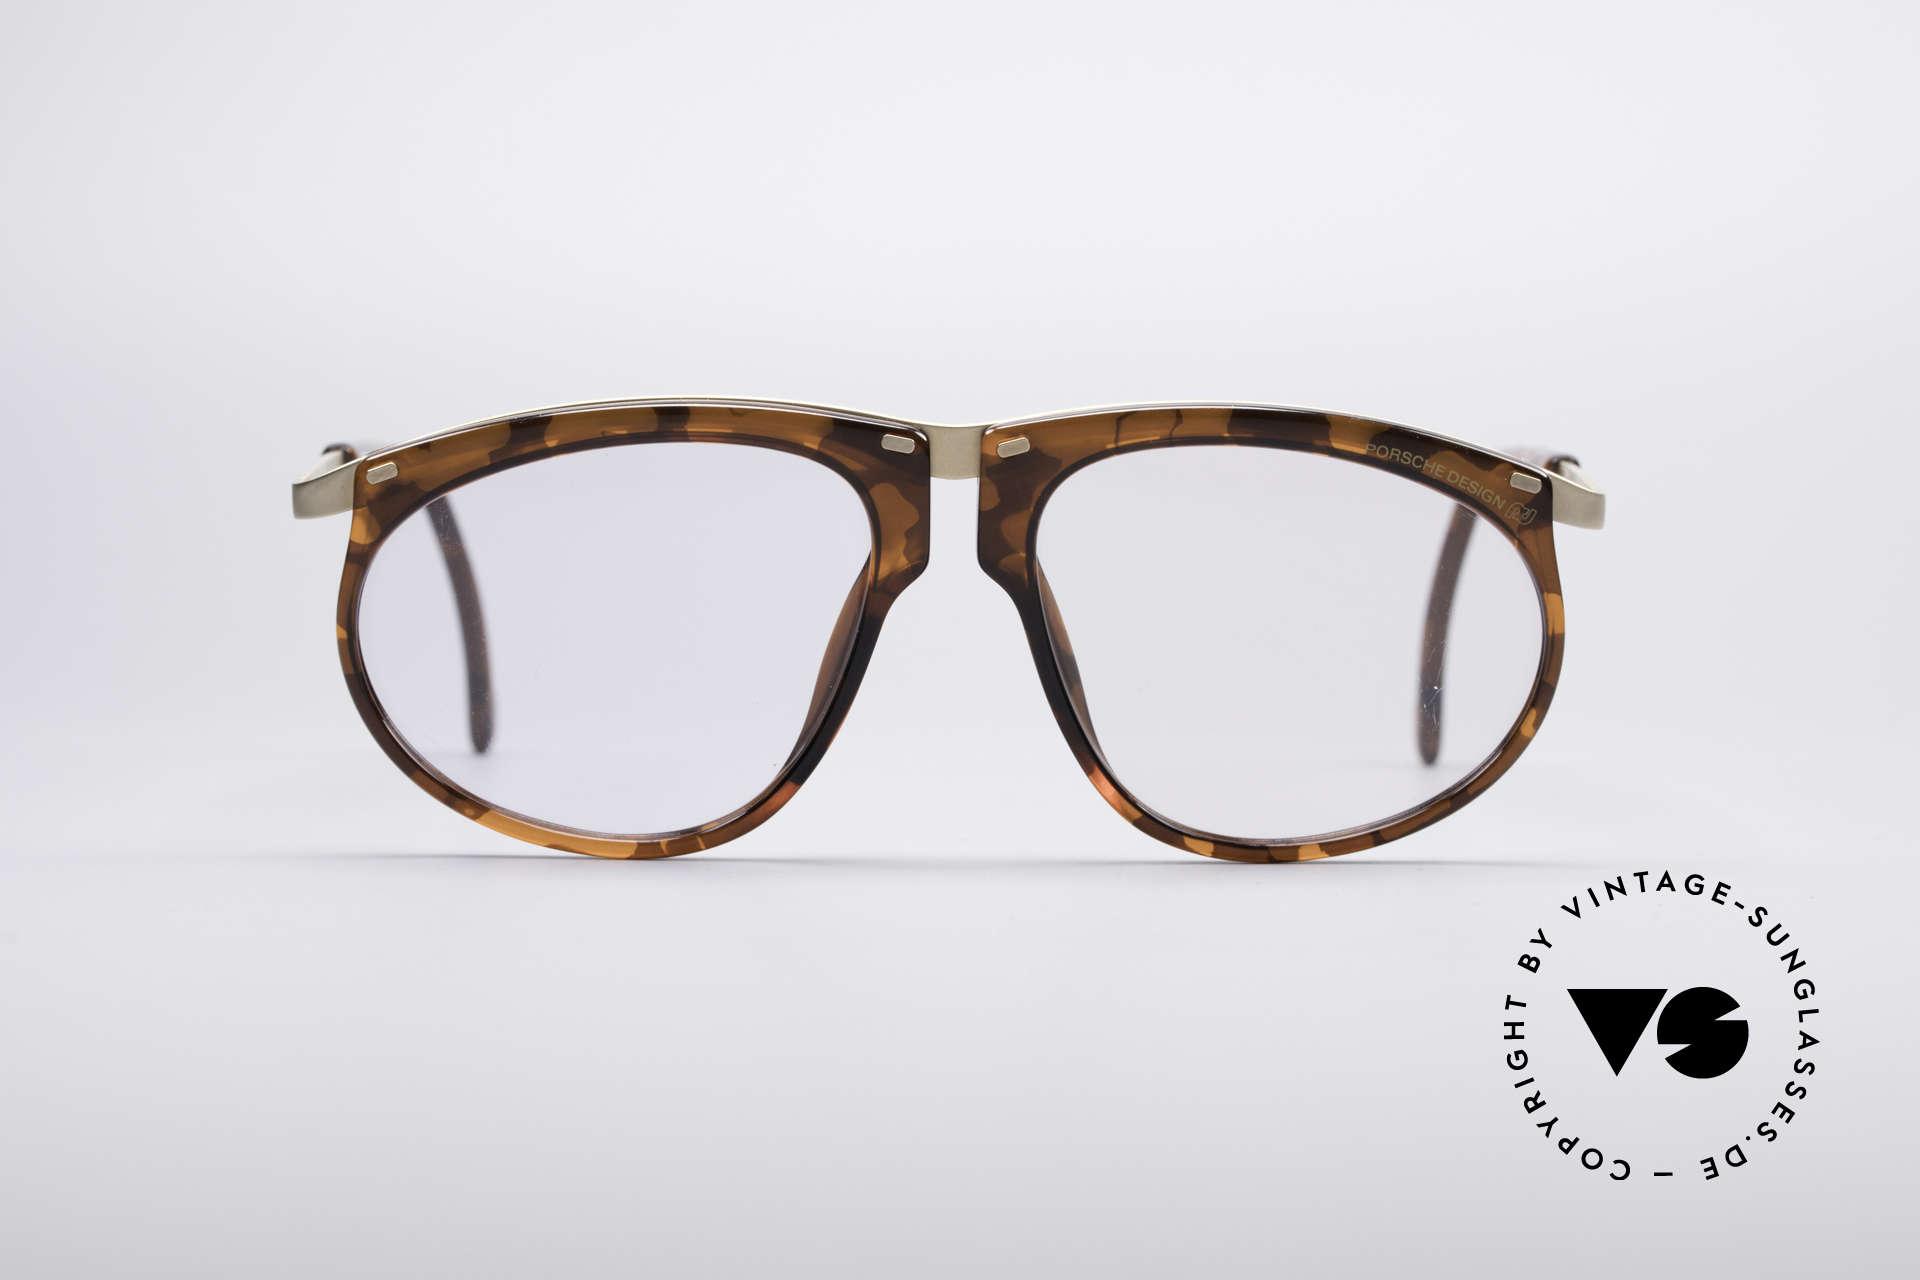 Porsche 5660 Adjustable Vintage Frame, customizable thanks to adjustable temple lenghts, Made for Men